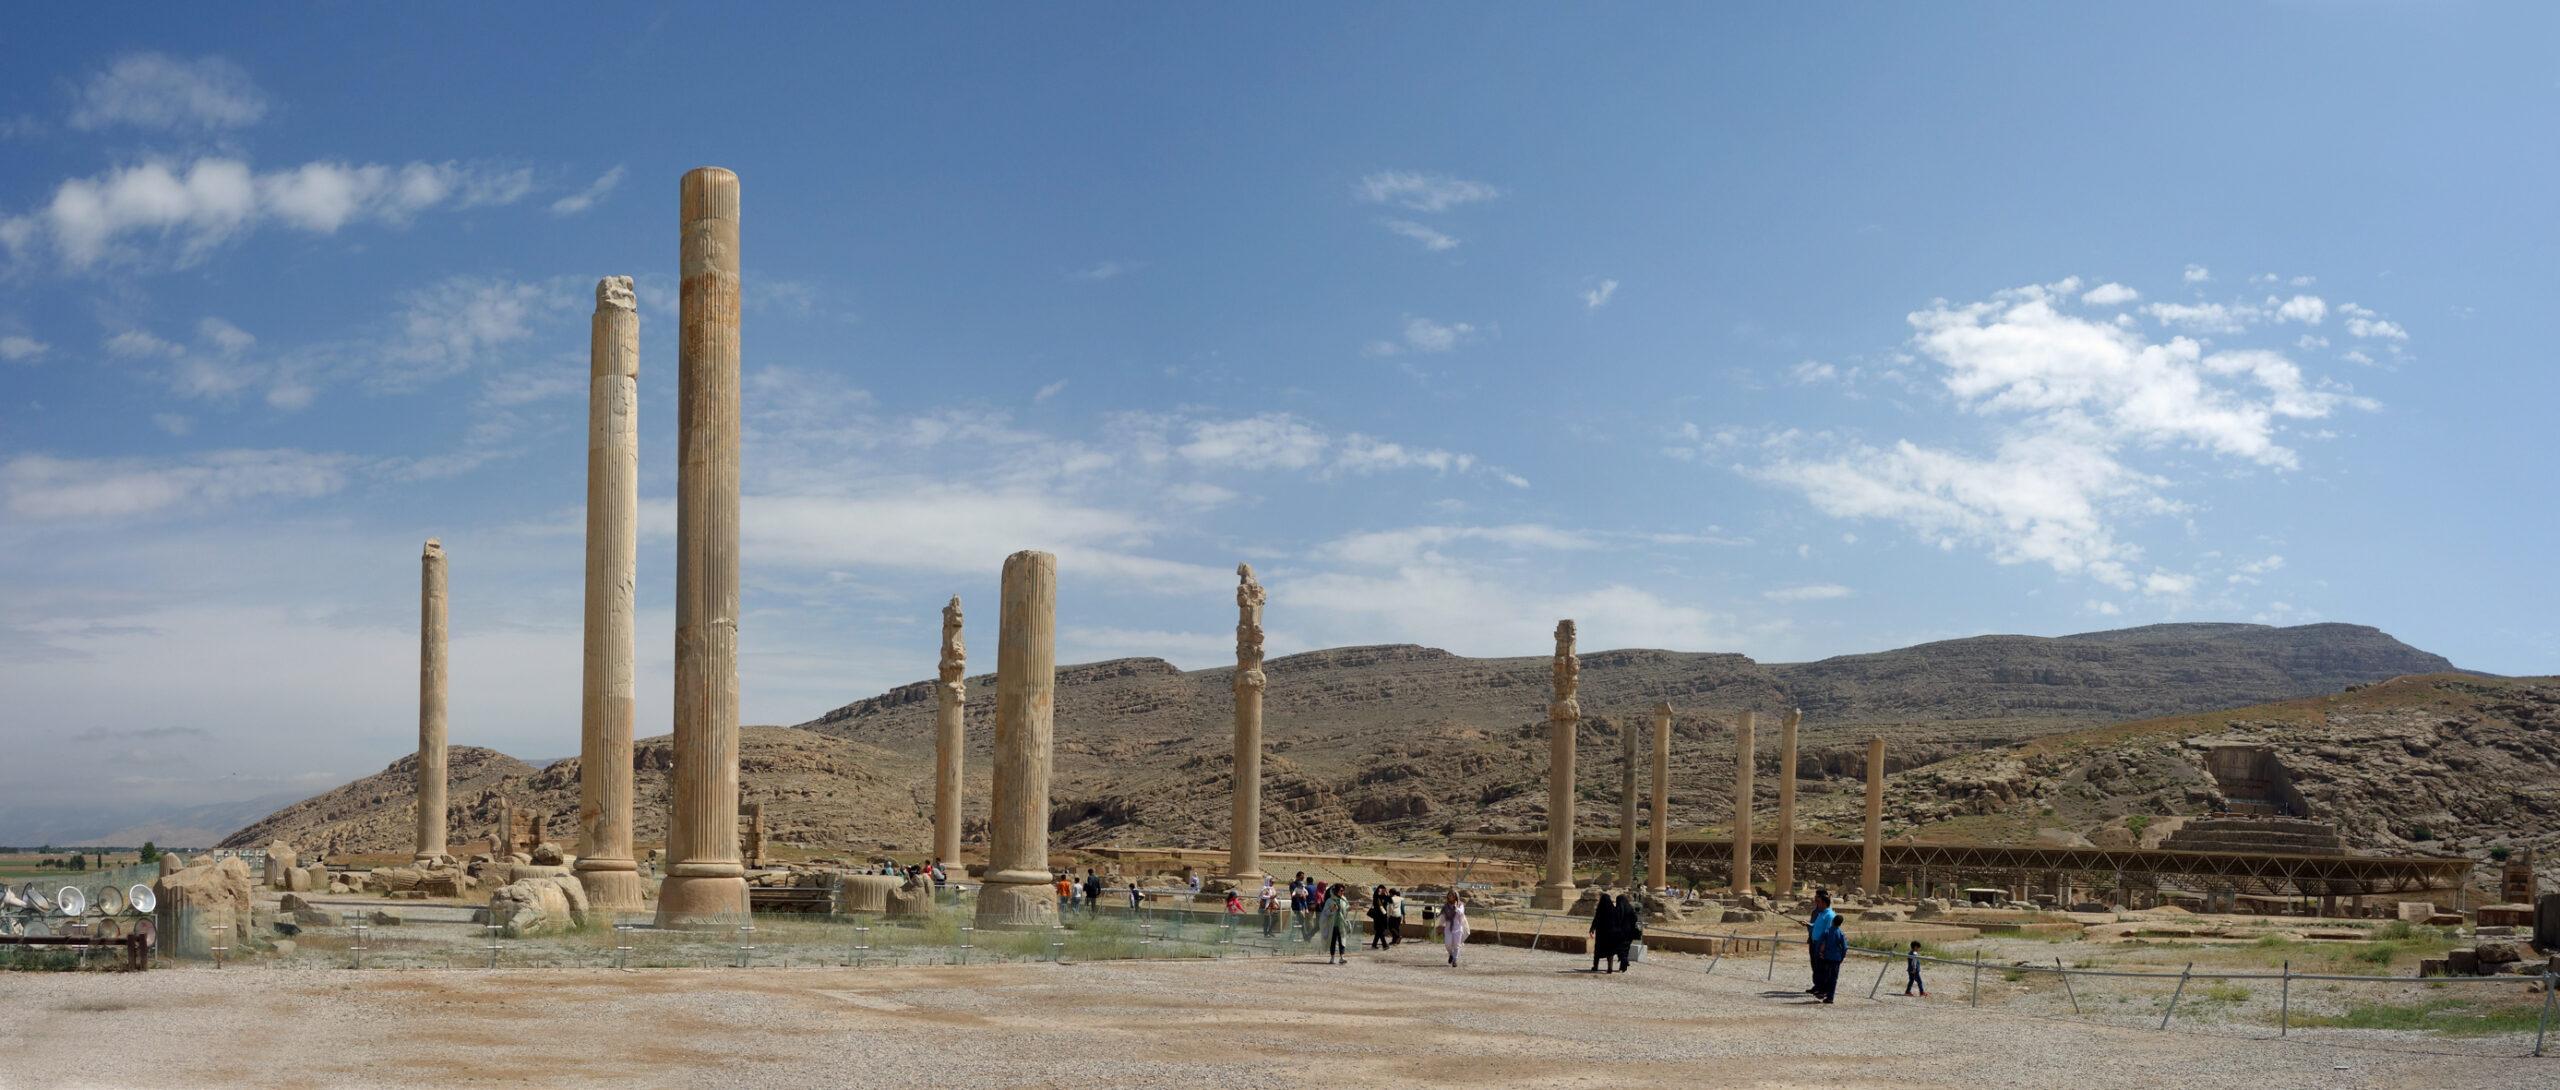 Persepolis: general view of Great Hall